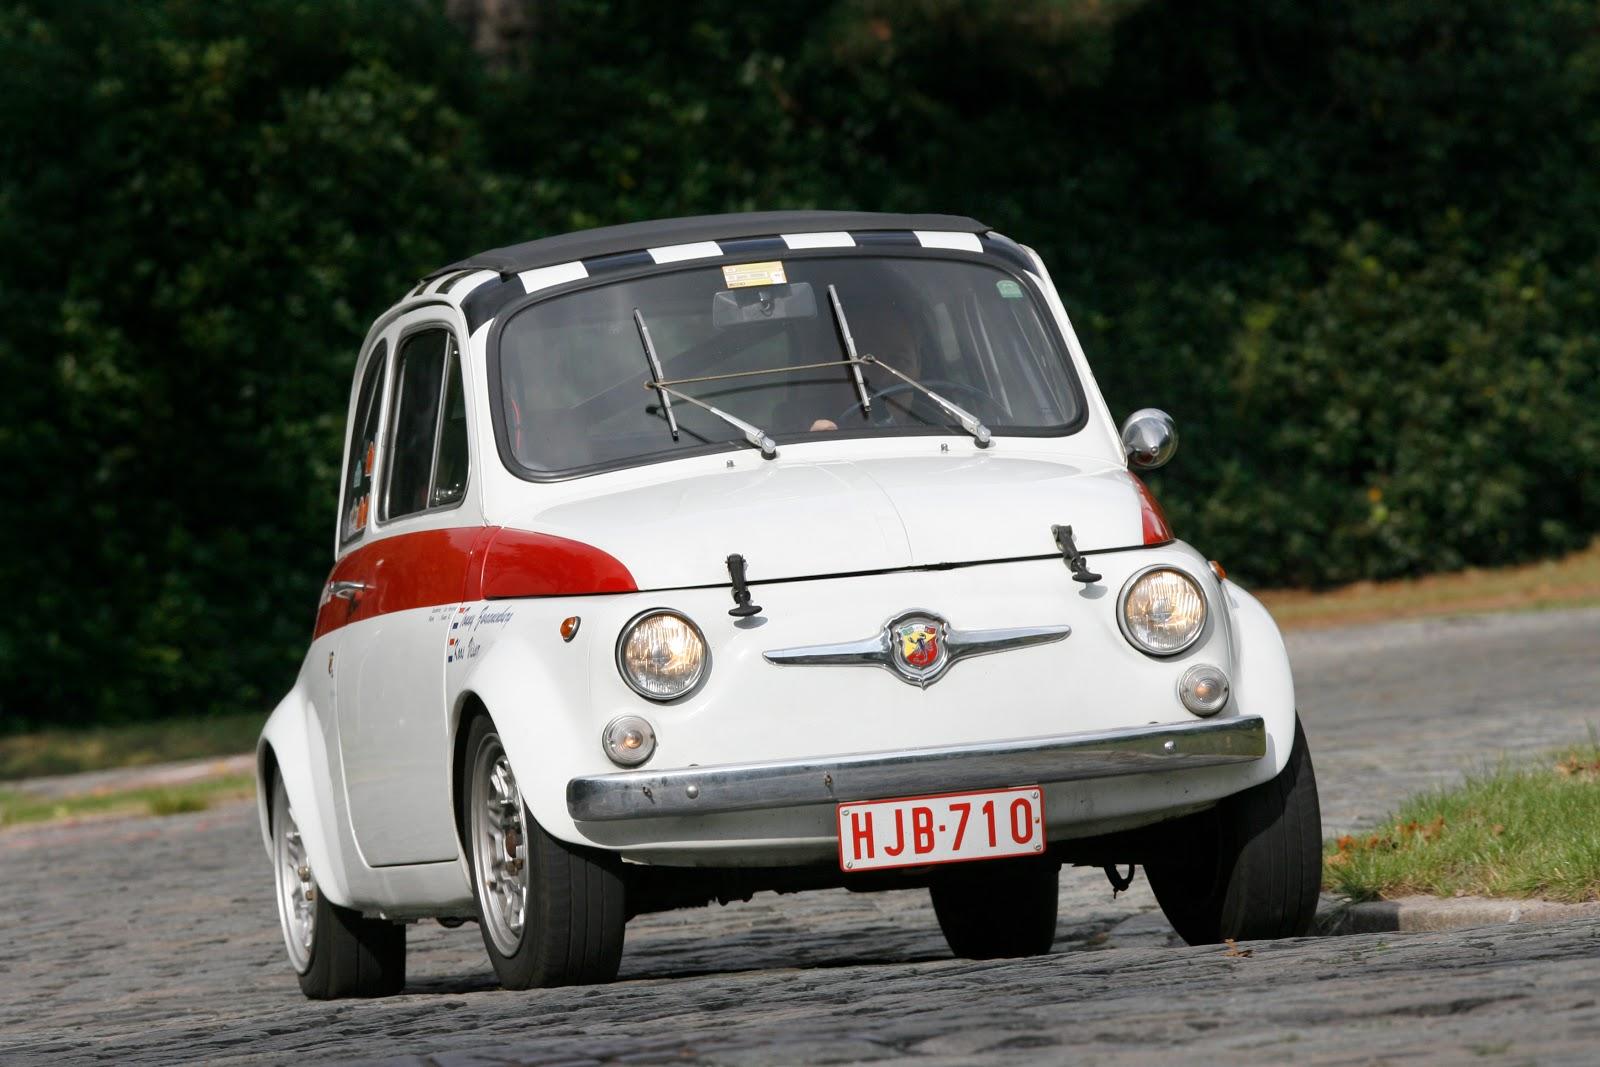 http://3.bp.blogspot.com/_c5aGOeESsa4/TQnjxn4ojQI/AAAAAAAAAOg/Bwako5yEOPs/s1600/Fiat_Abarth_695_SS.jpg